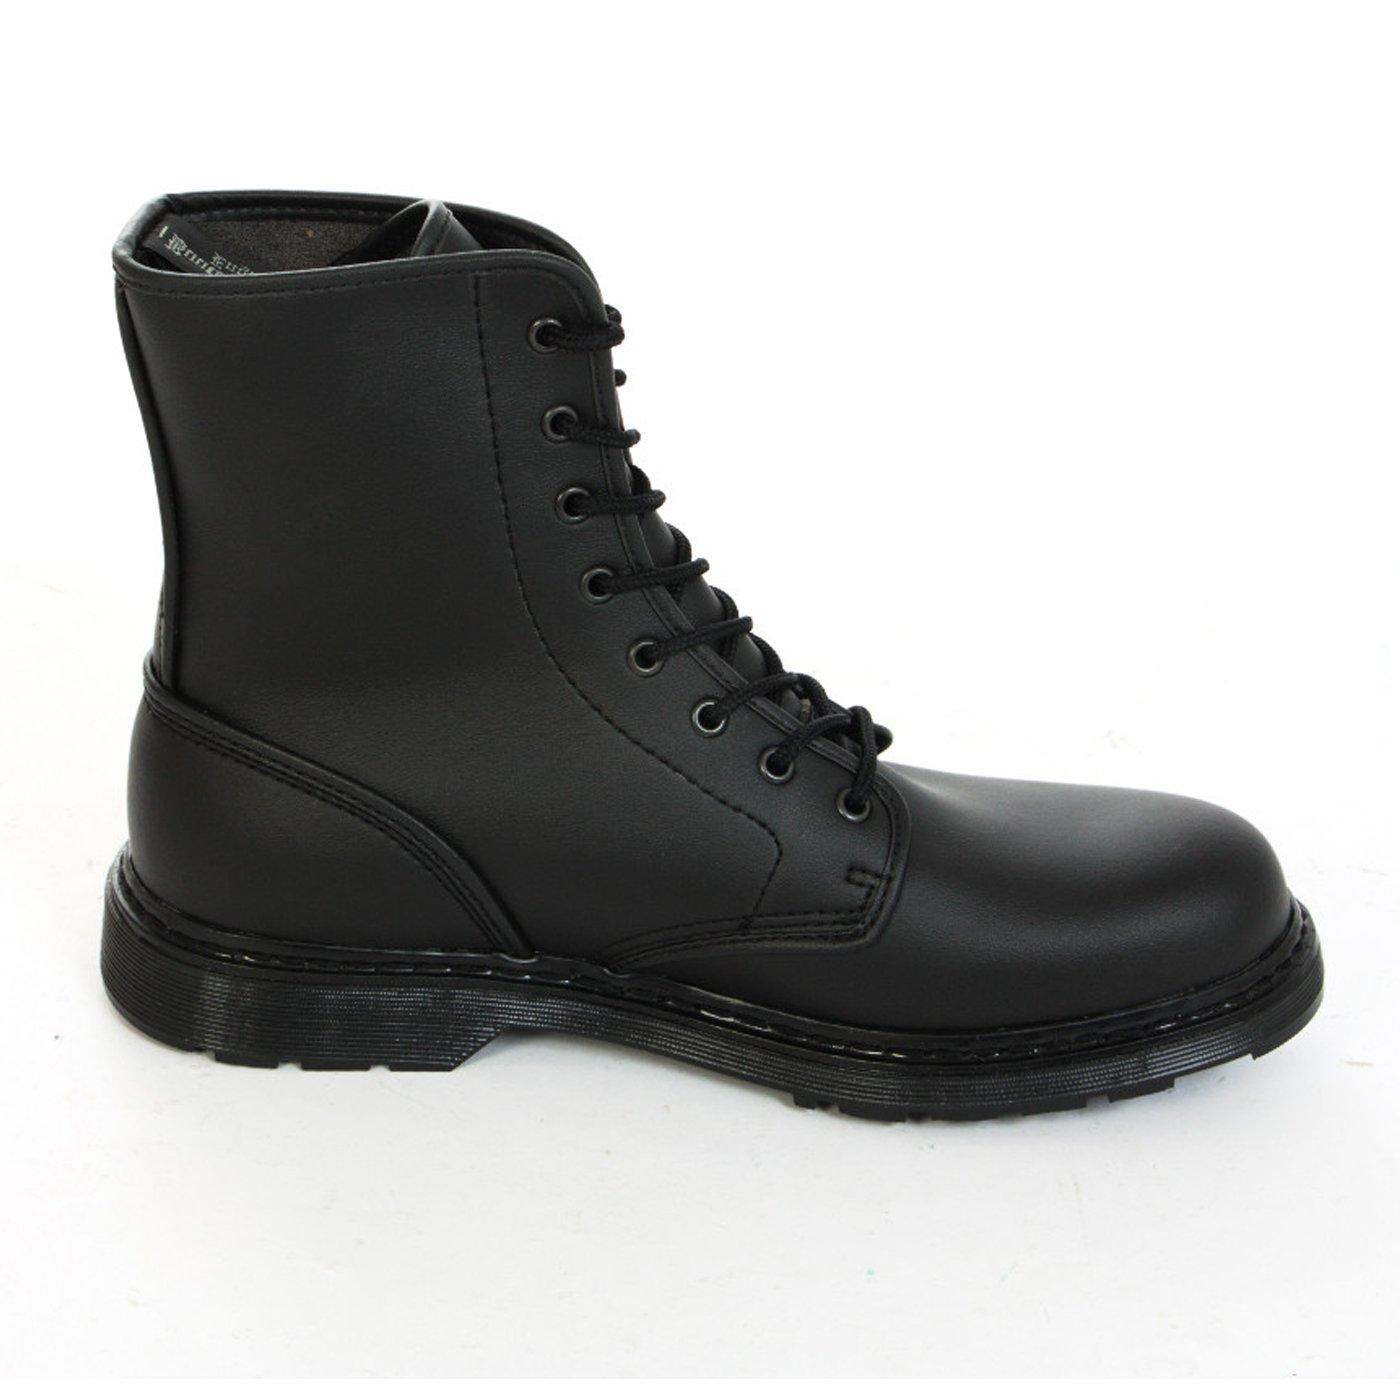 Stiefel & Braces - Easy 8 Schwarz Loch Vegetarian schwarz Stiefel Rangers Schwarz 8 schwarz On schwarz d42fa8